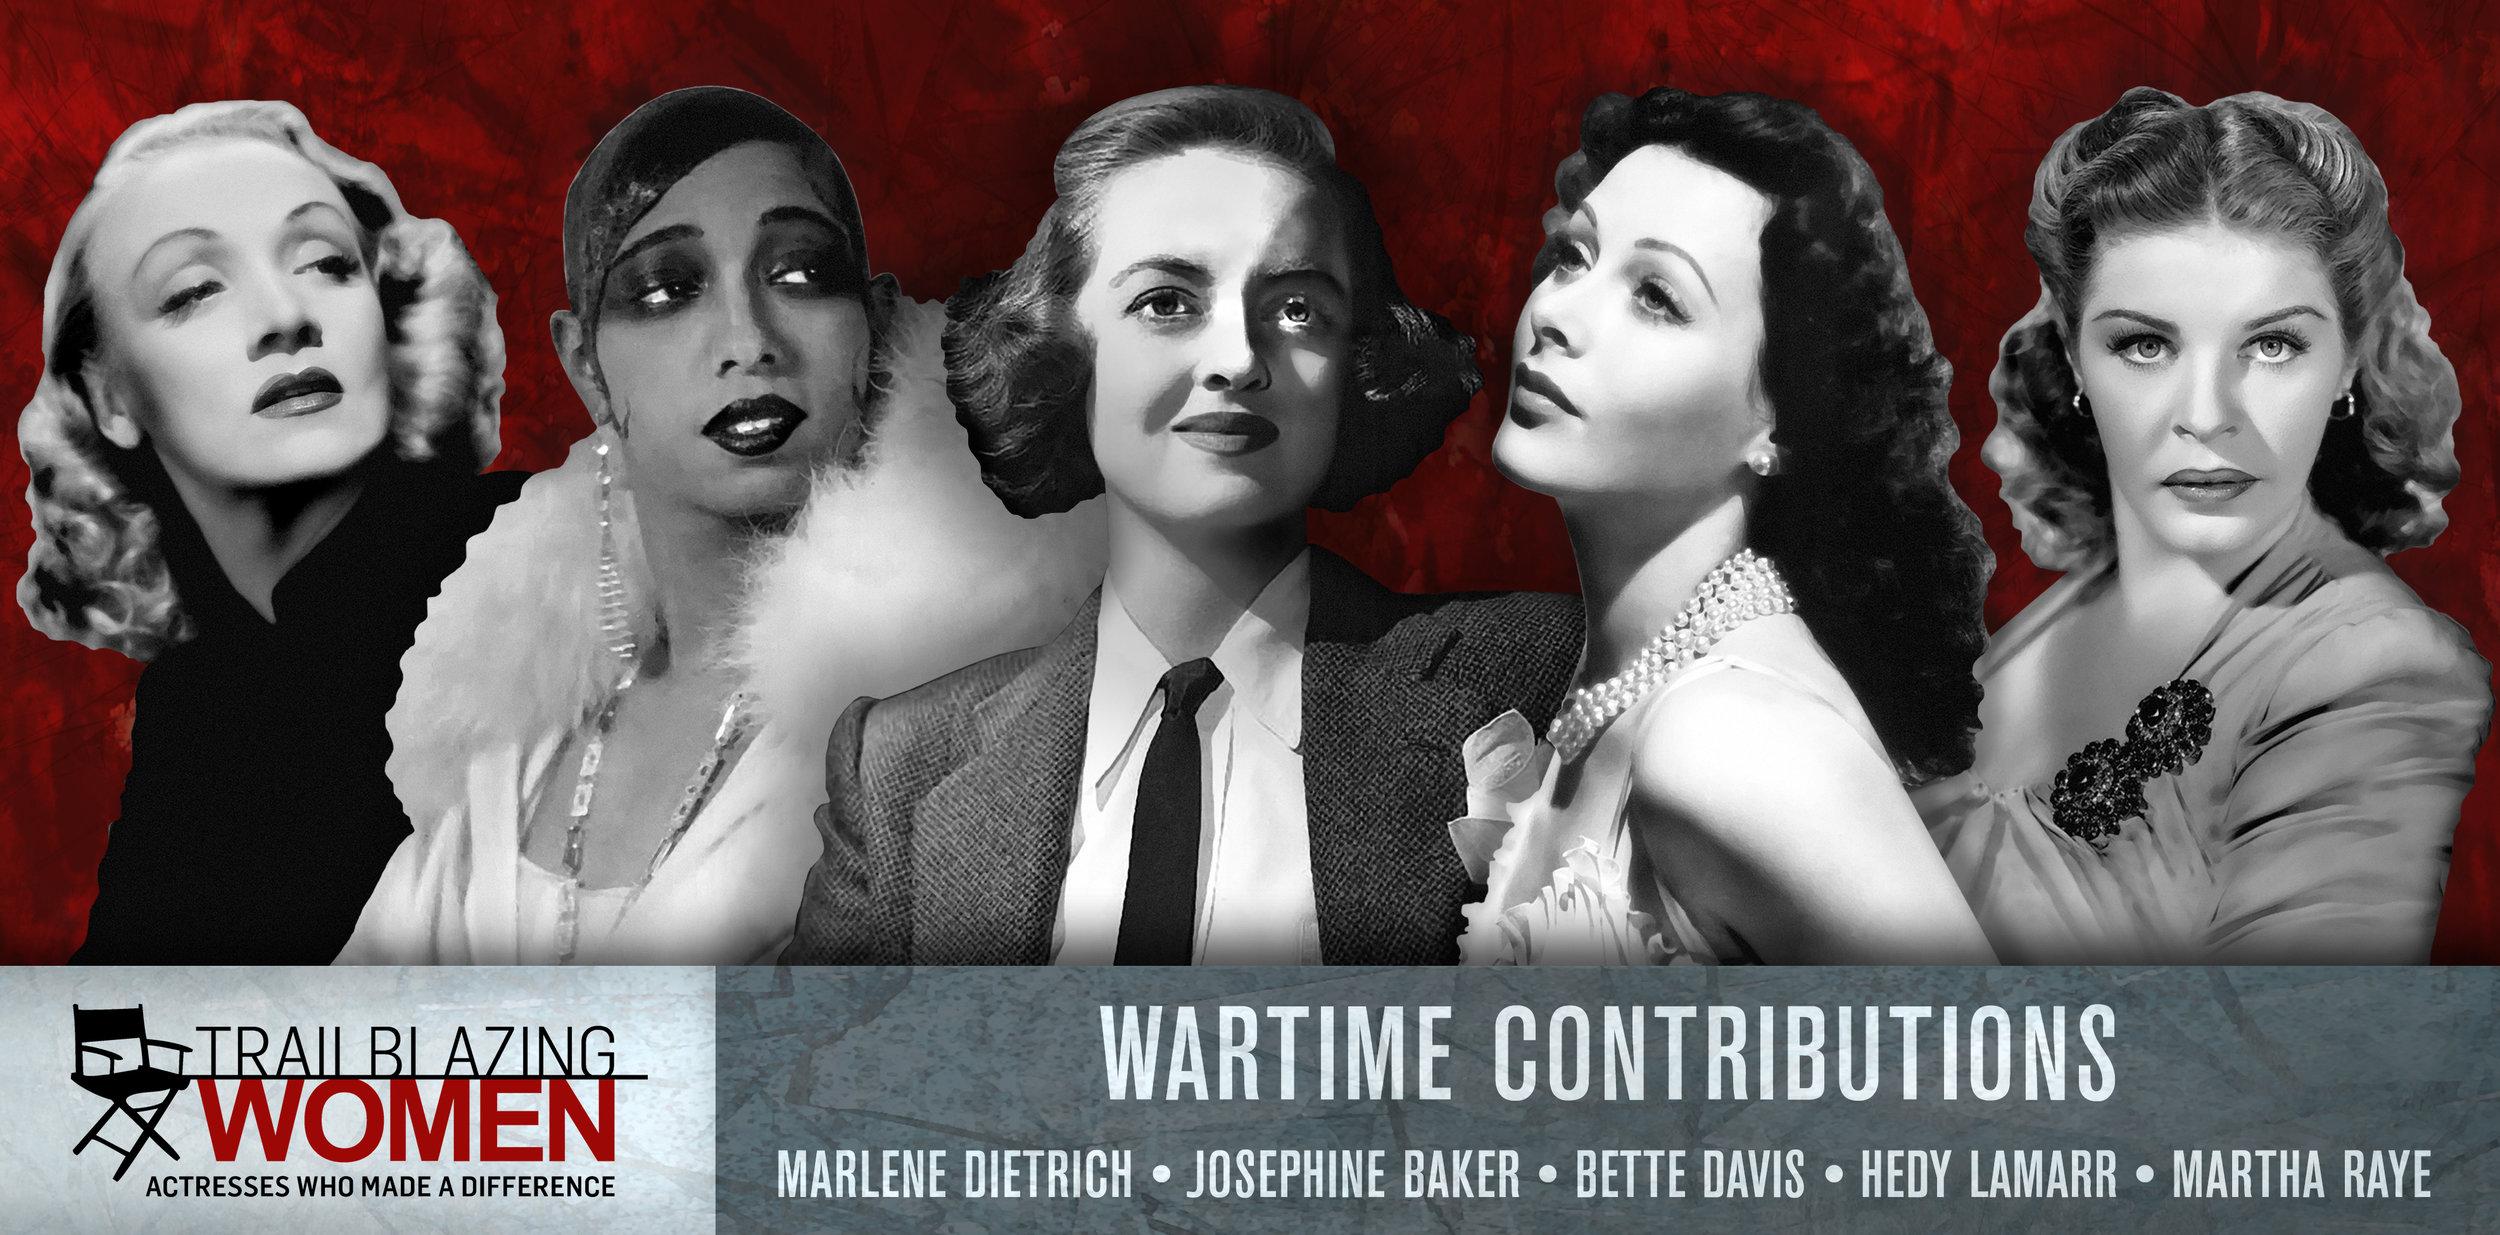 TBW_2016_3-WartimeContributions_RV.jpg